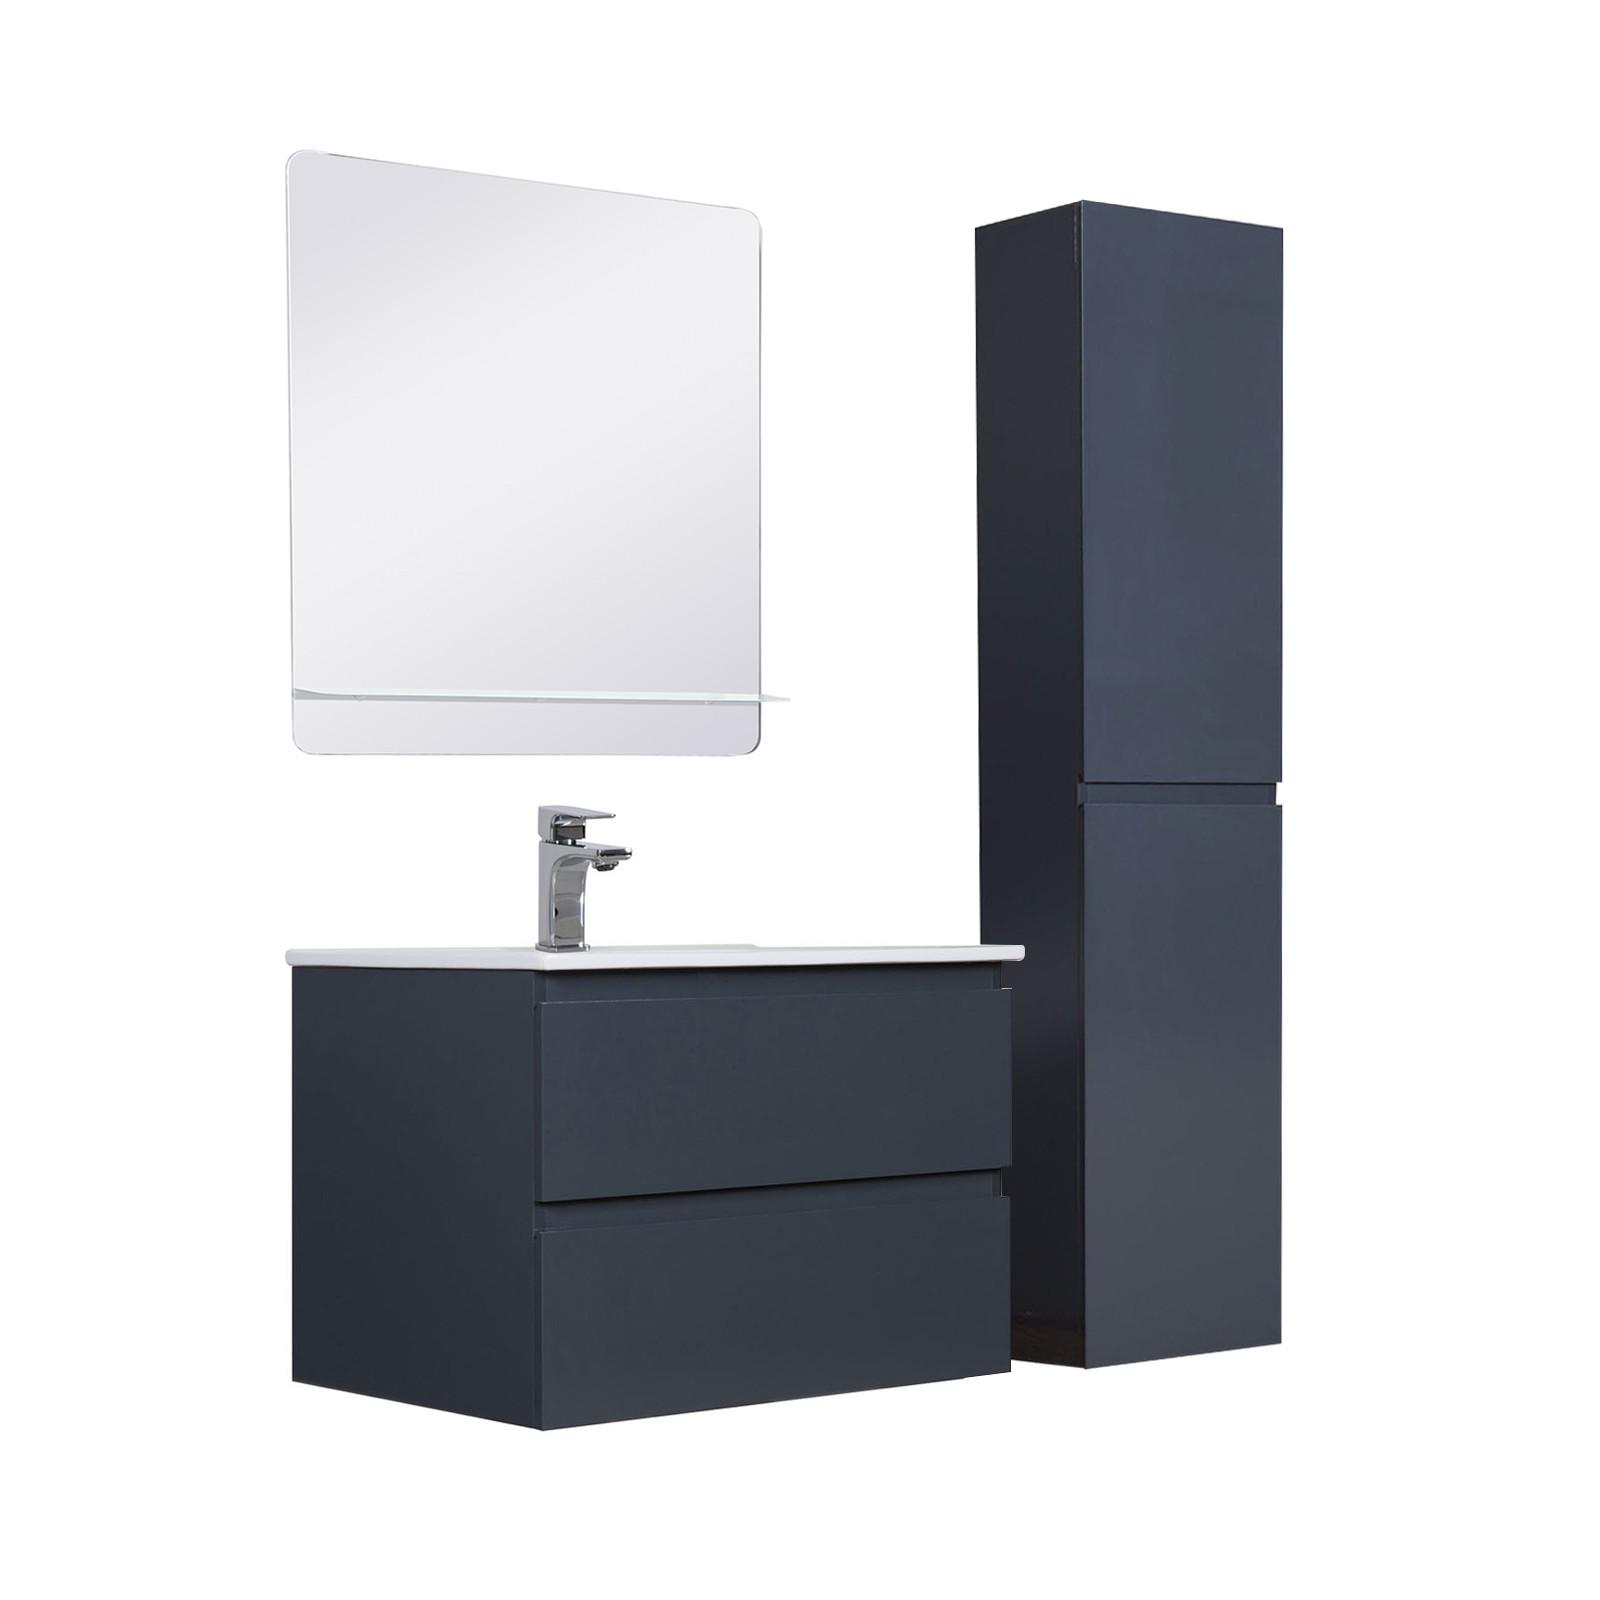 Meuble Salle de Bain 60 cm + Colonne Gris Anthracite + Miroir SORRENTO